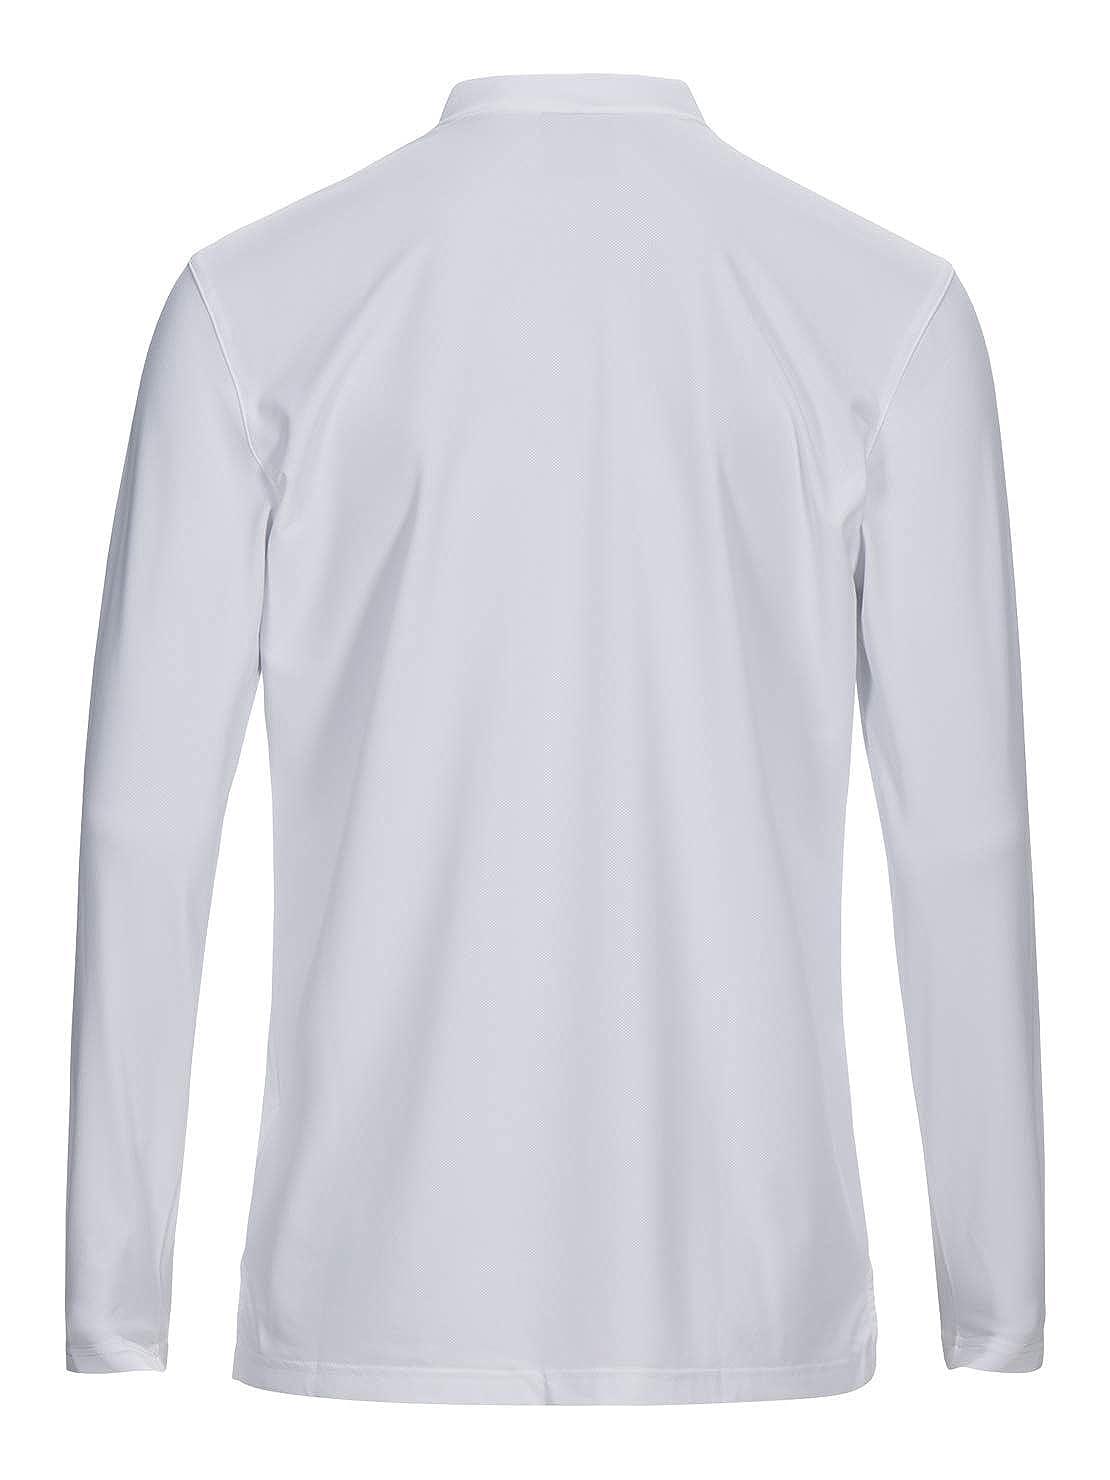 PEAK PERFORMANCE Austin - Polo de manga larga, color blanco ...